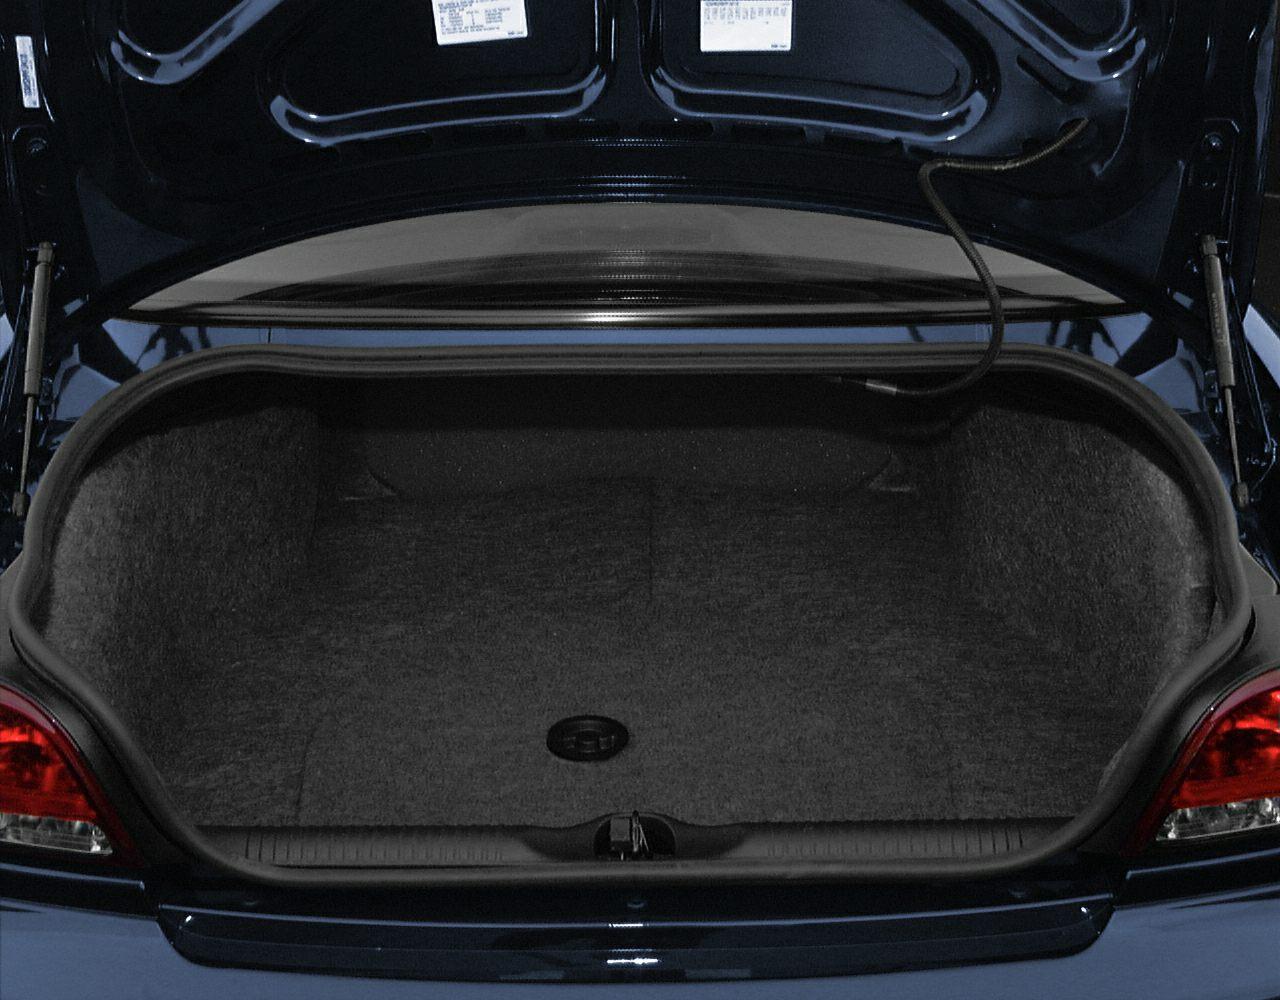 2000 Oldsmobile Intrigue Exterior Photo